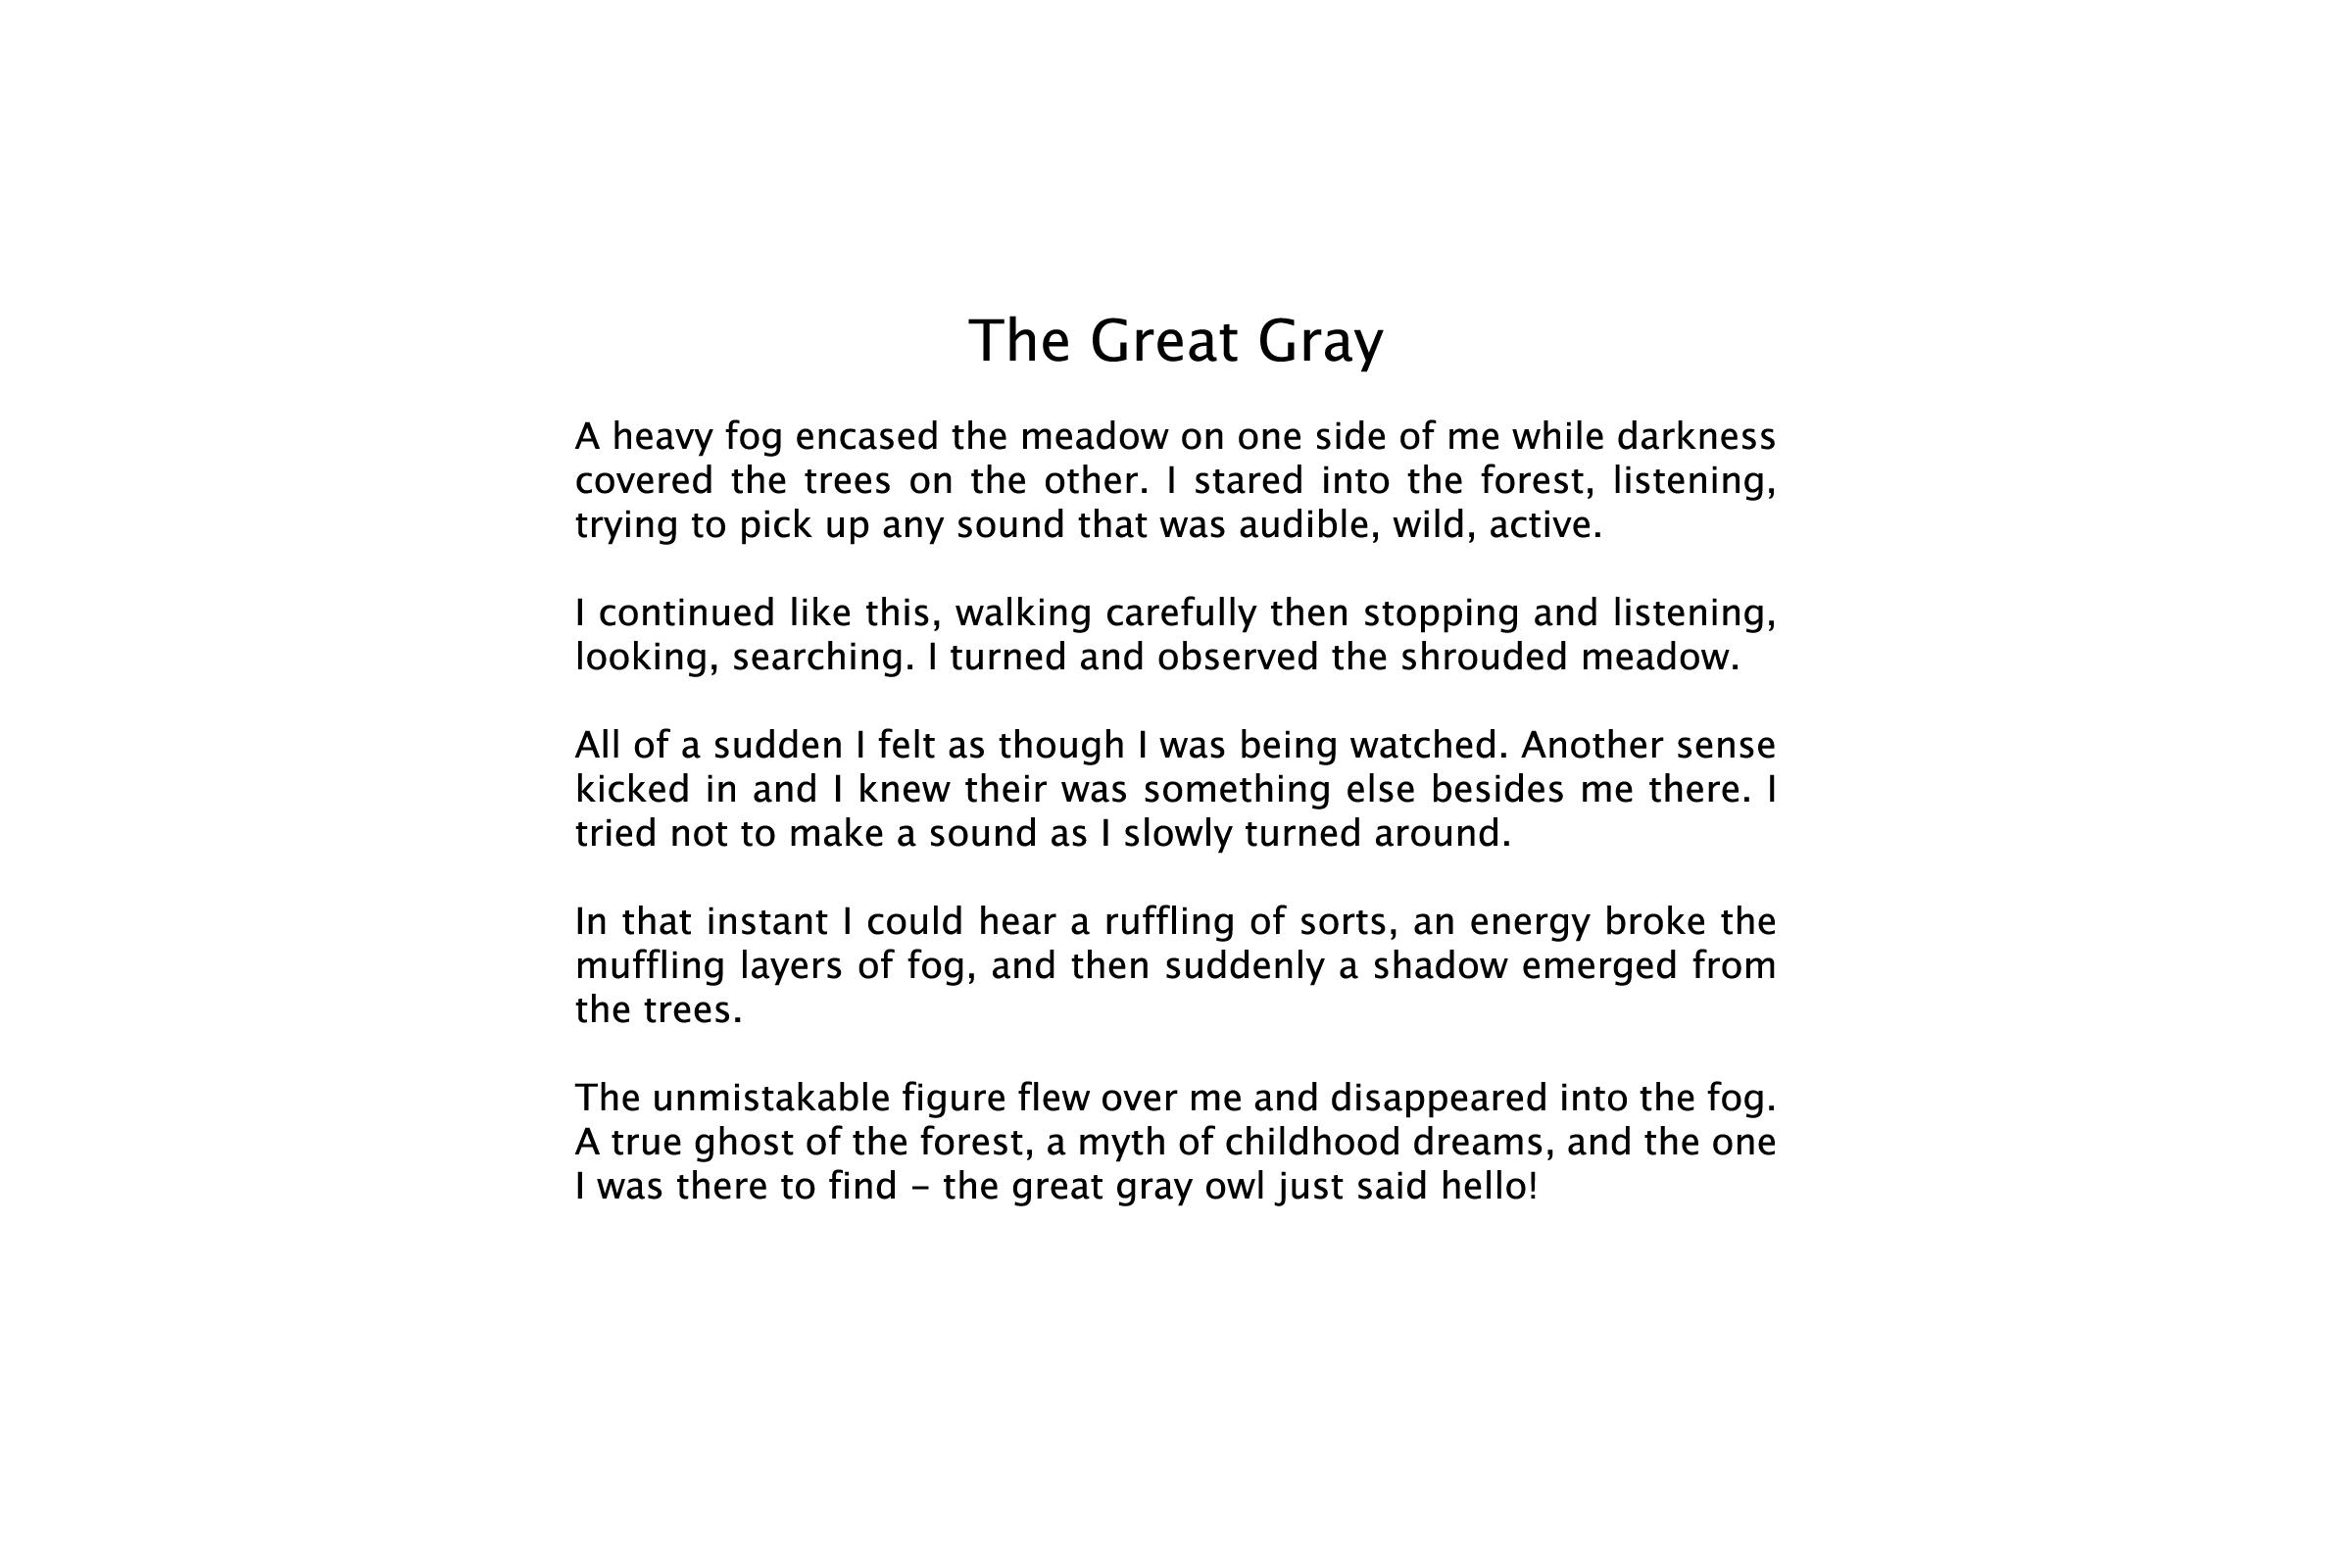 TheGreatGrayFlat.jpg